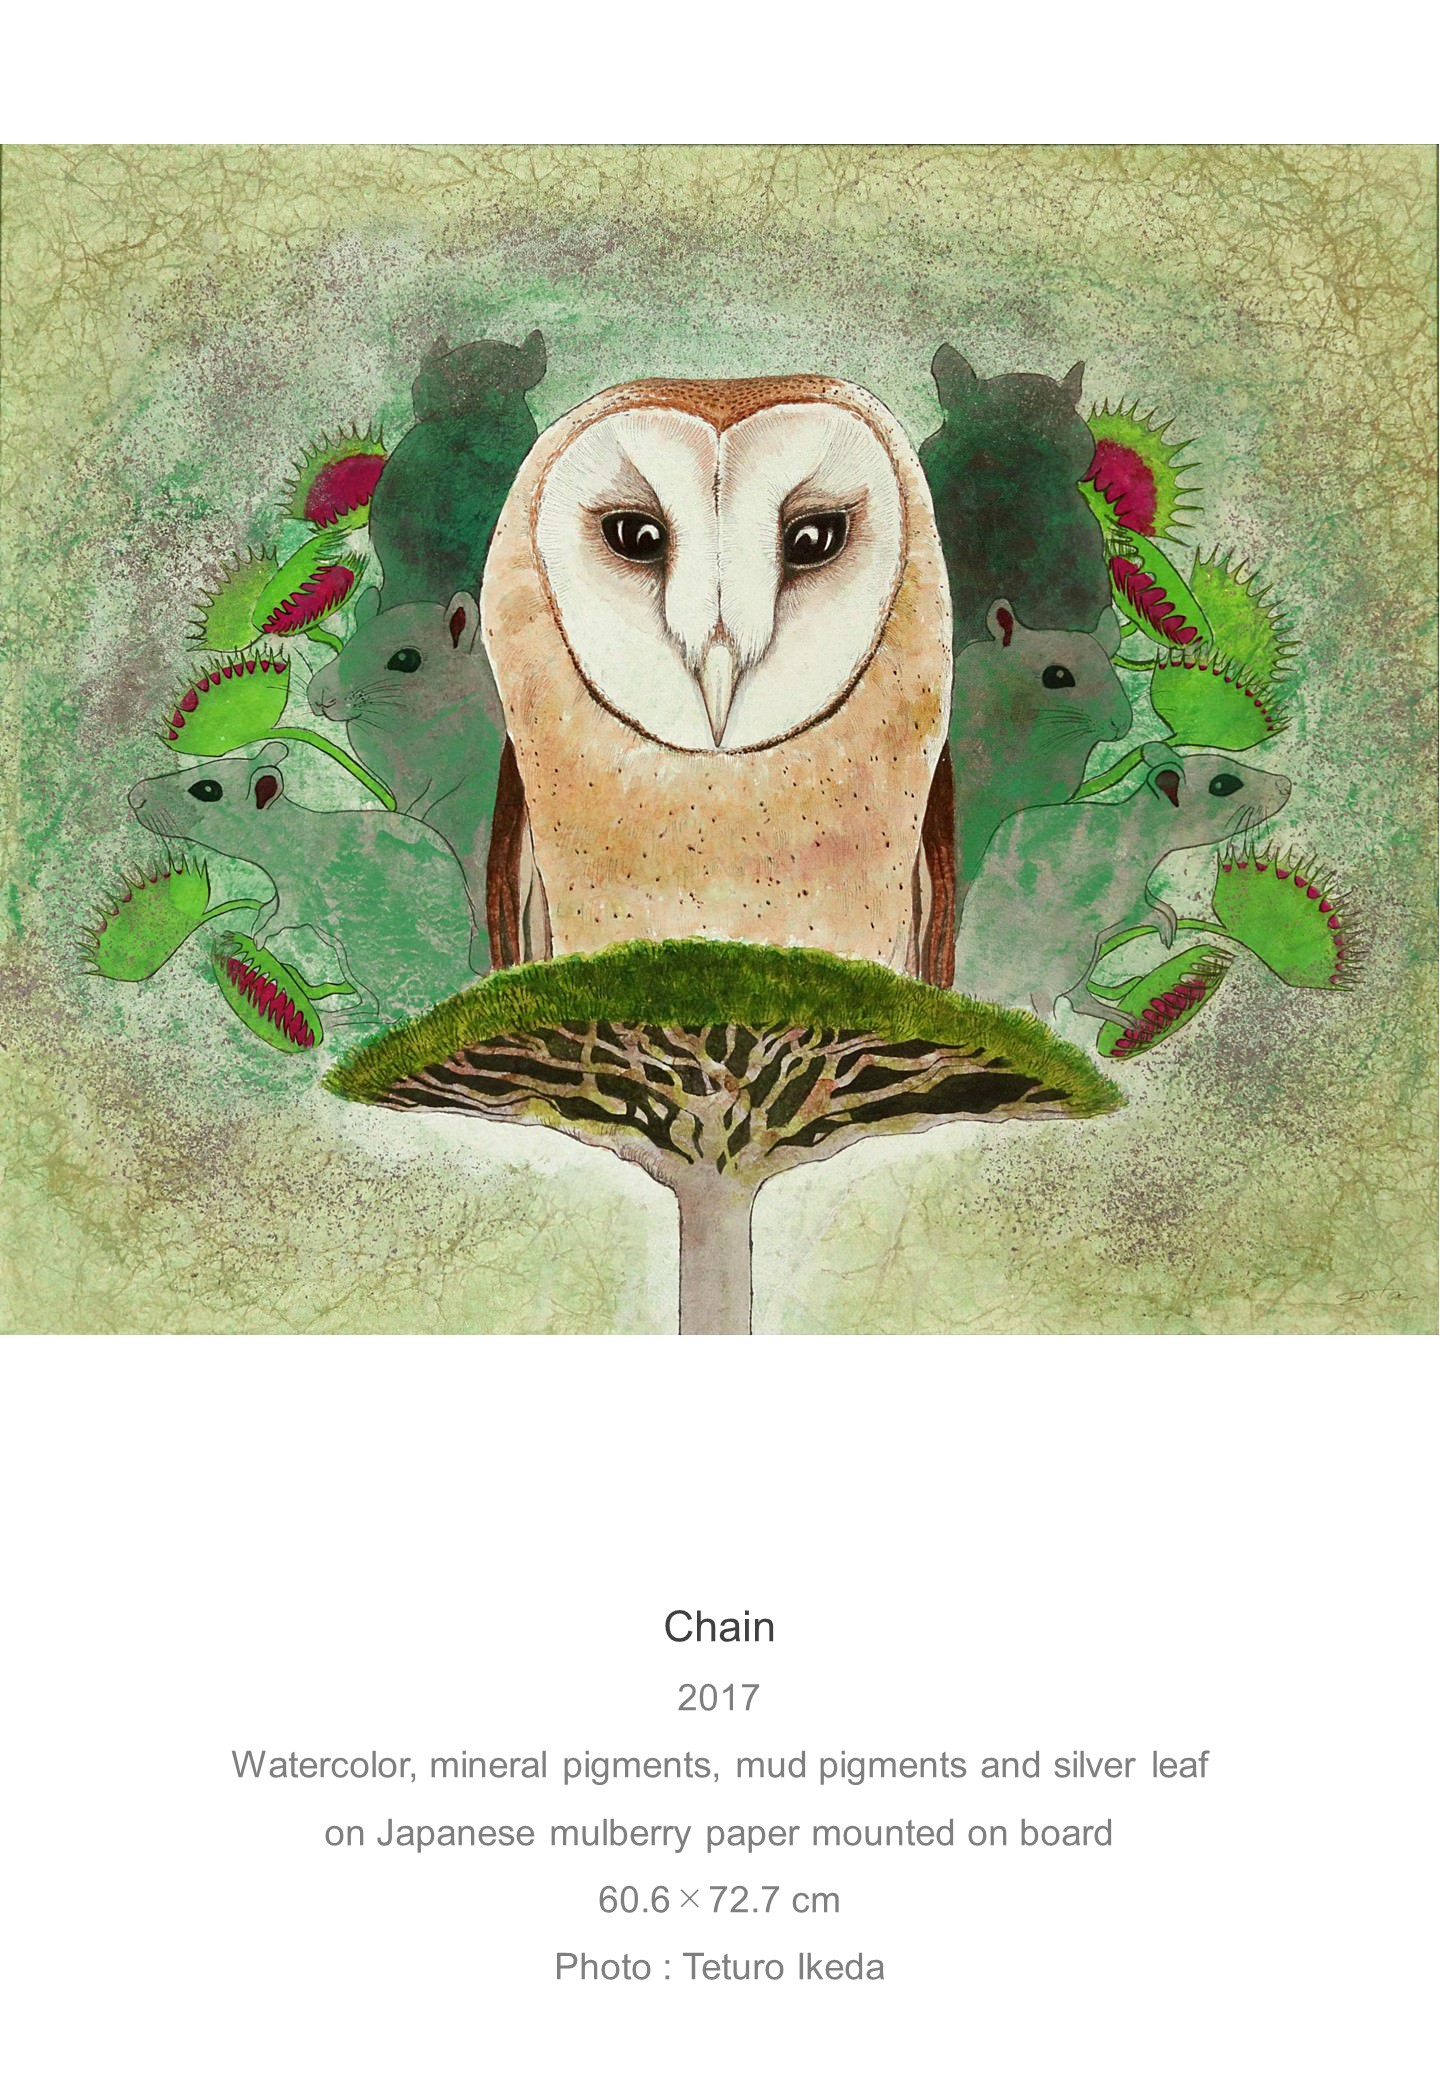 Shota Imai's Artwork of Chain